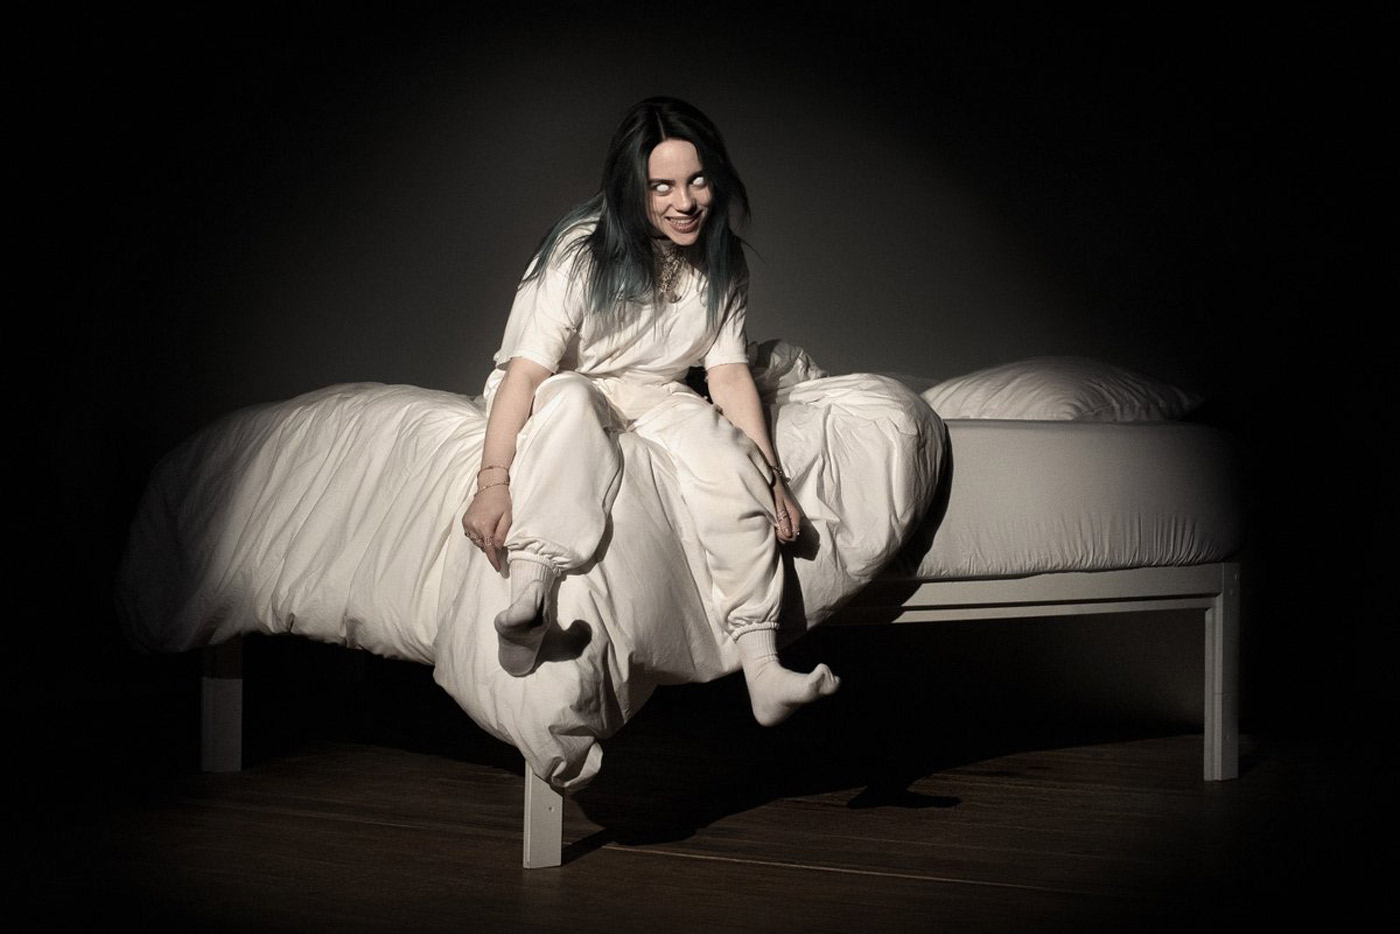 Billie Eilish anuncia su álbum debut